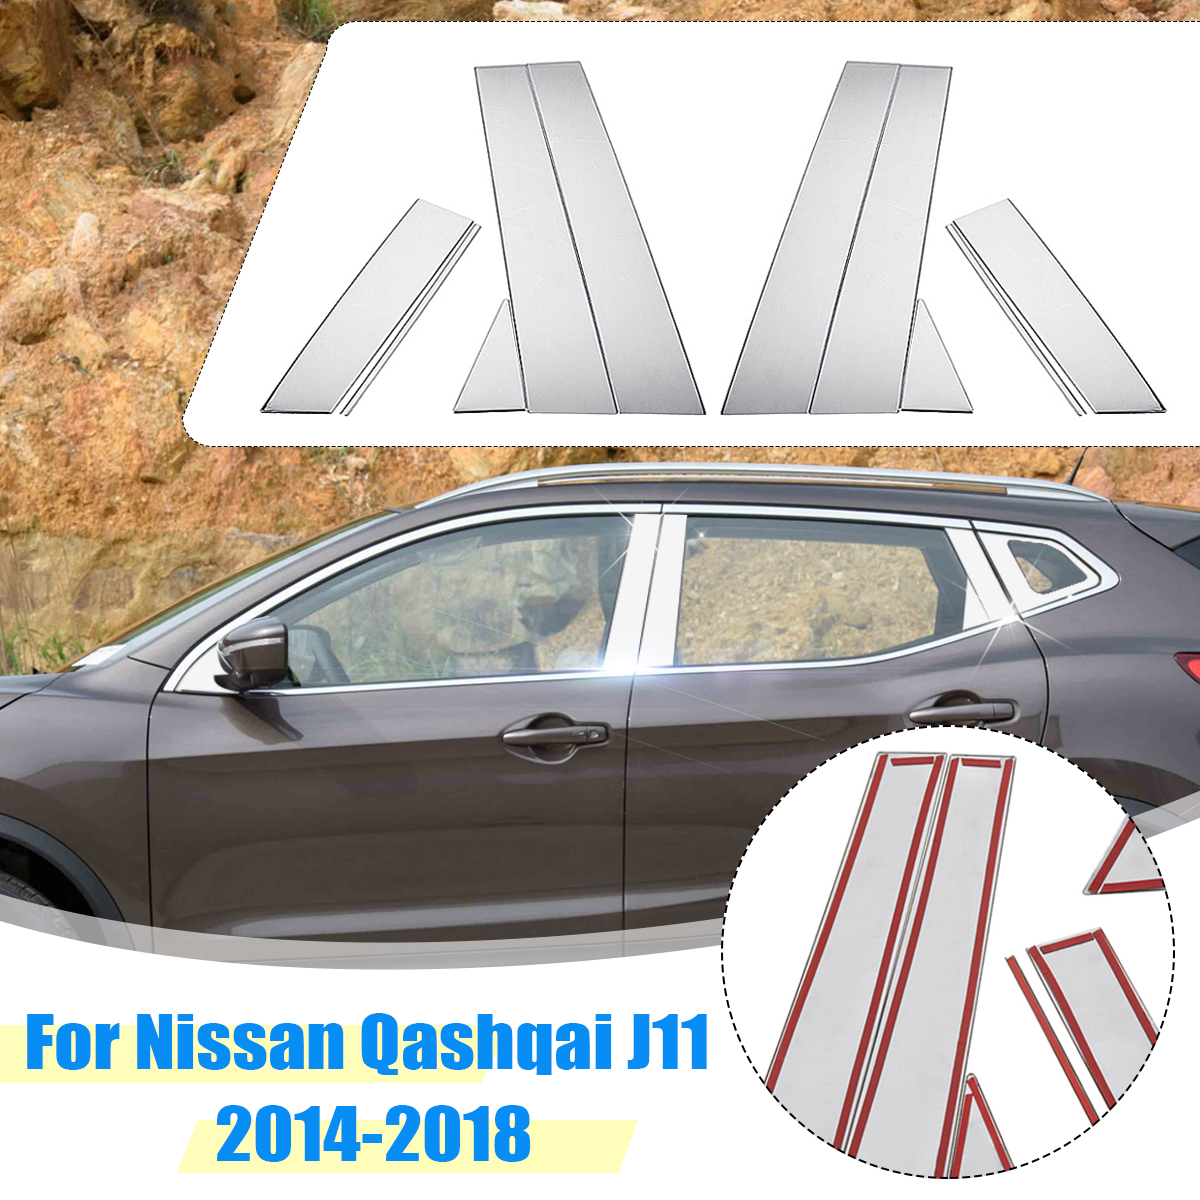 Stainless Steel pillar post trim For Nissan Qashqai J11 2014-2016